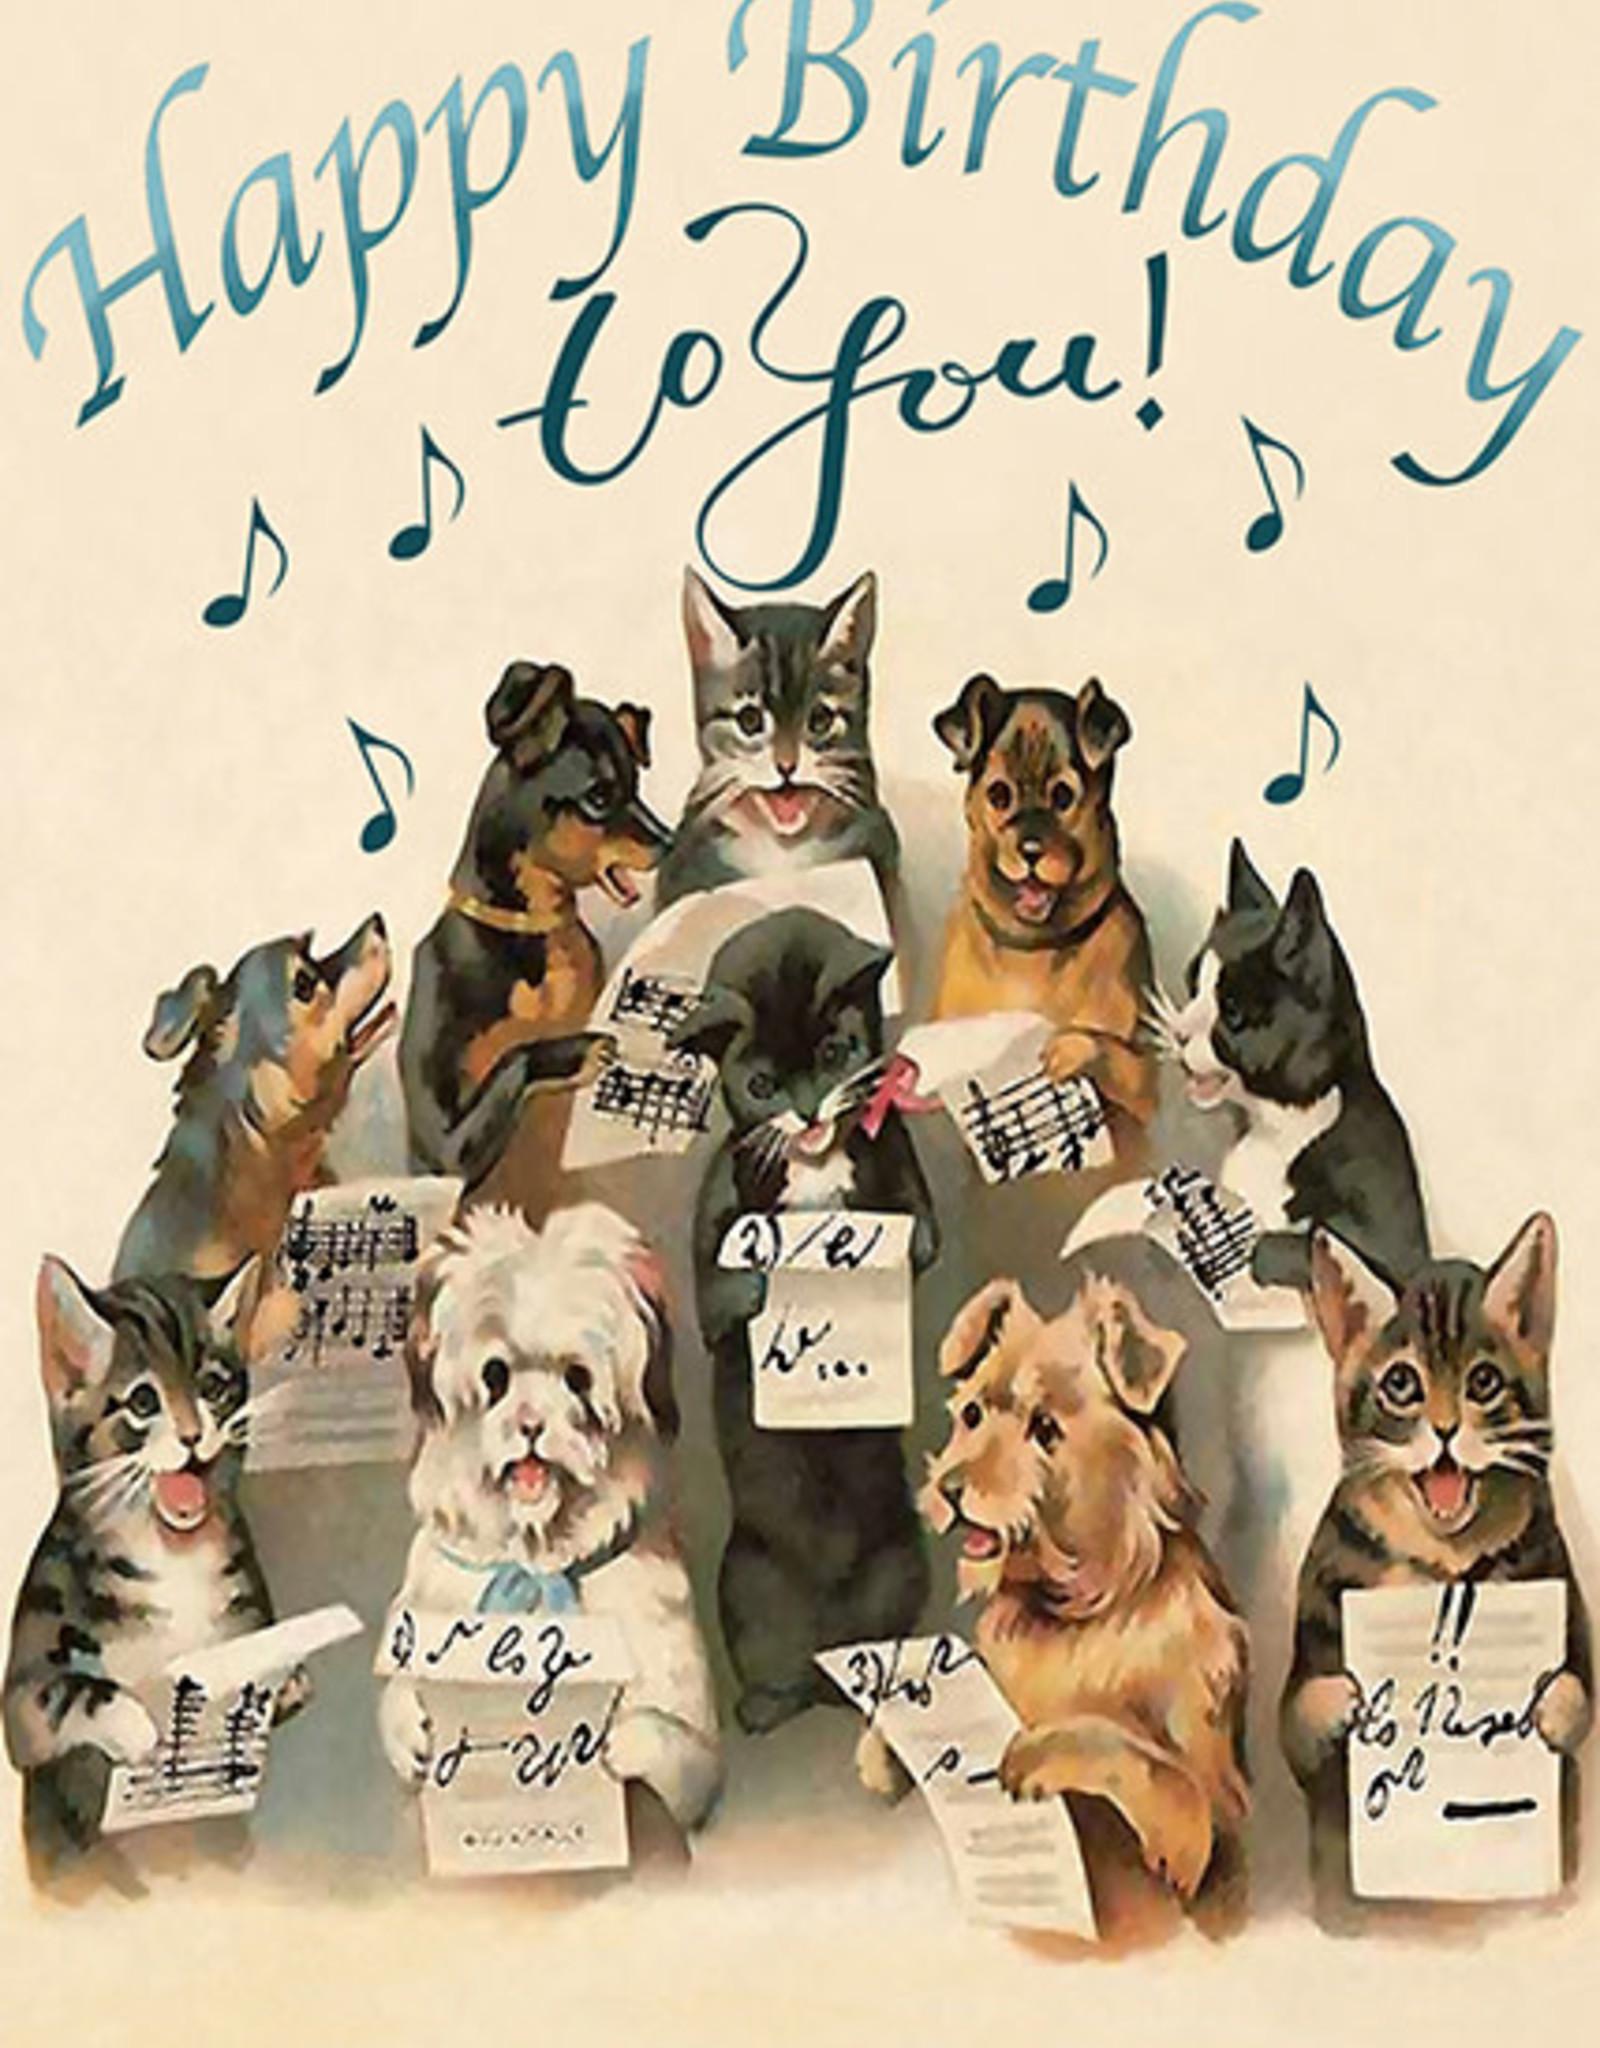 Madame Treacle Kaart groot 'Happy Birthday' - Singing dogs & cats